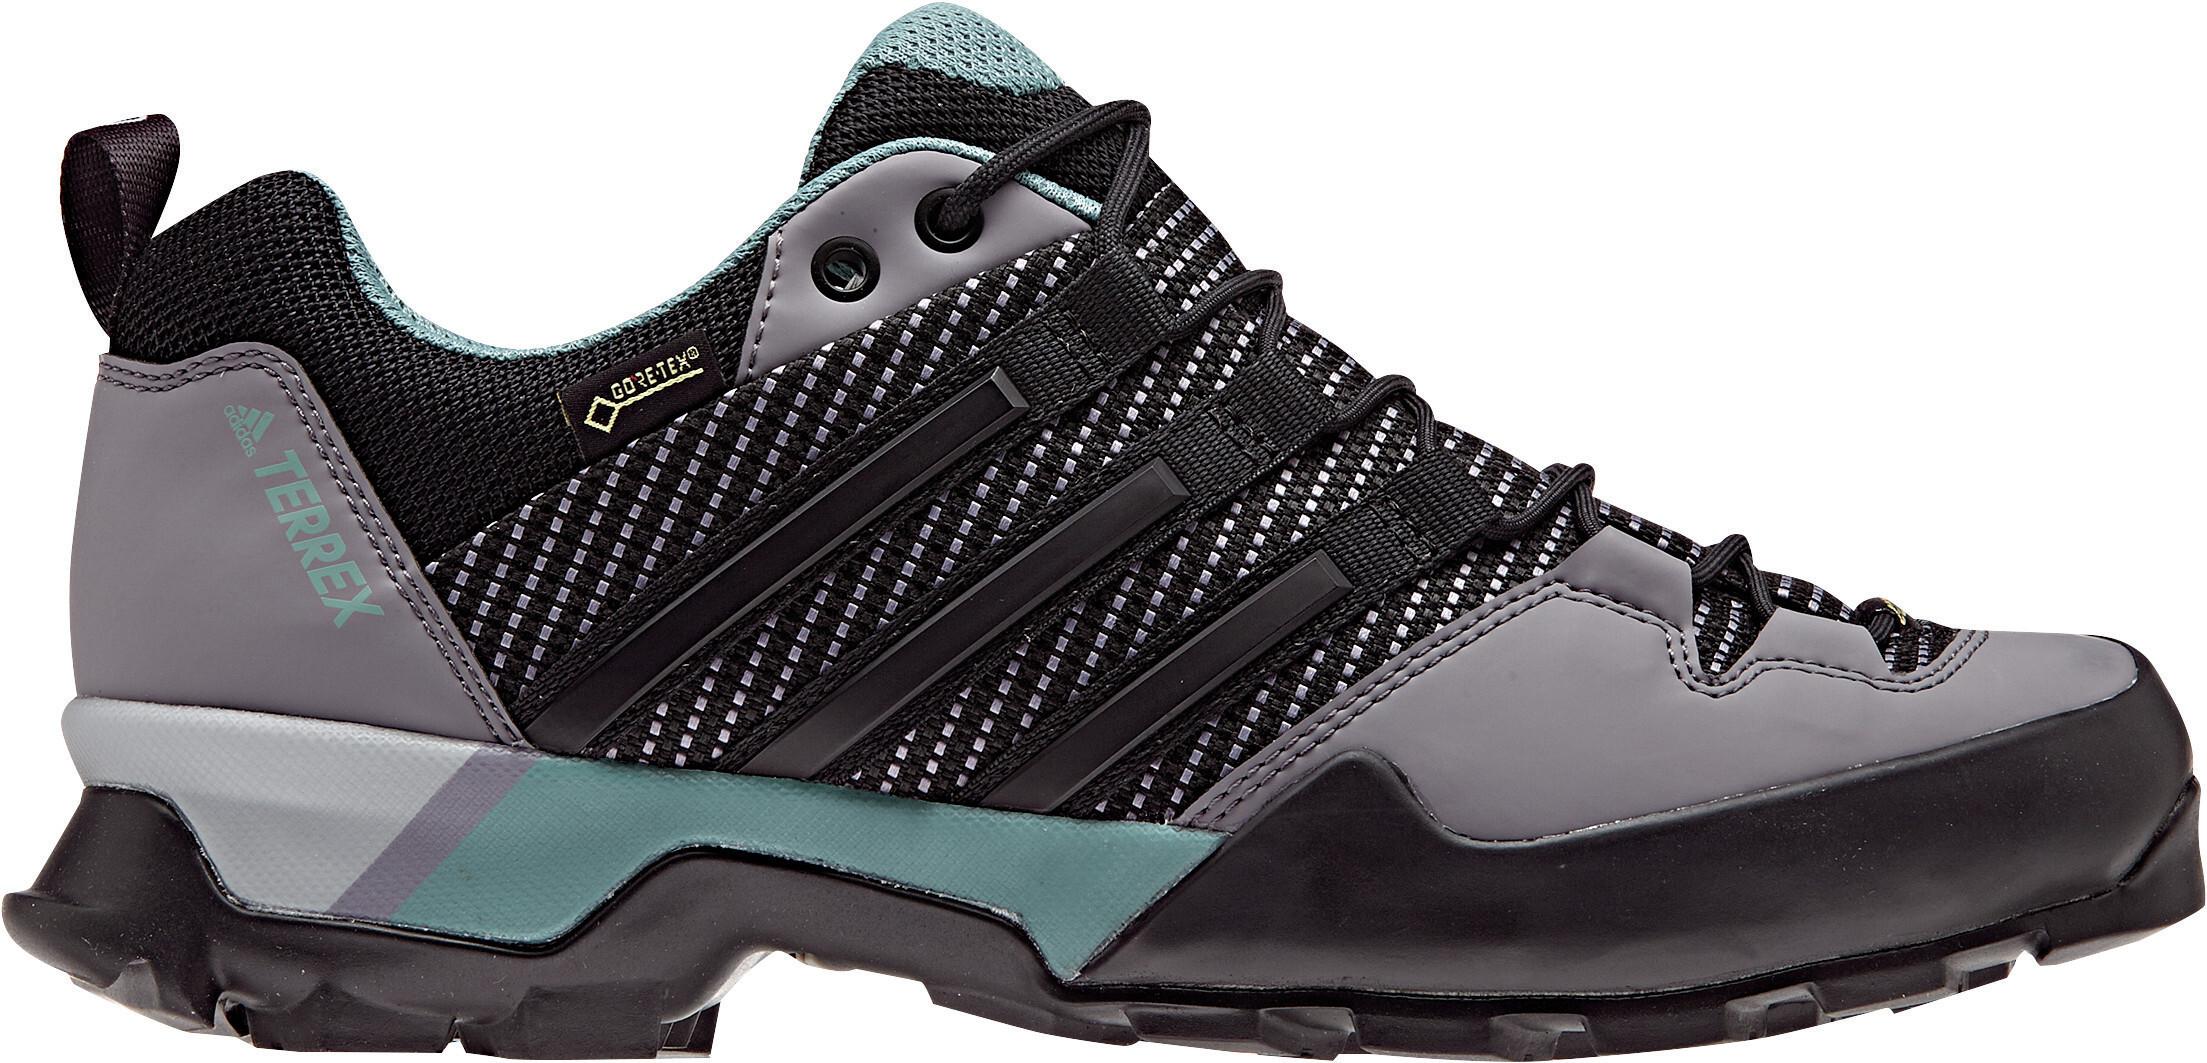 5501519da4f942 adidas TERREX Scope GTX Shoes Women grey black at Addnature.co.uk